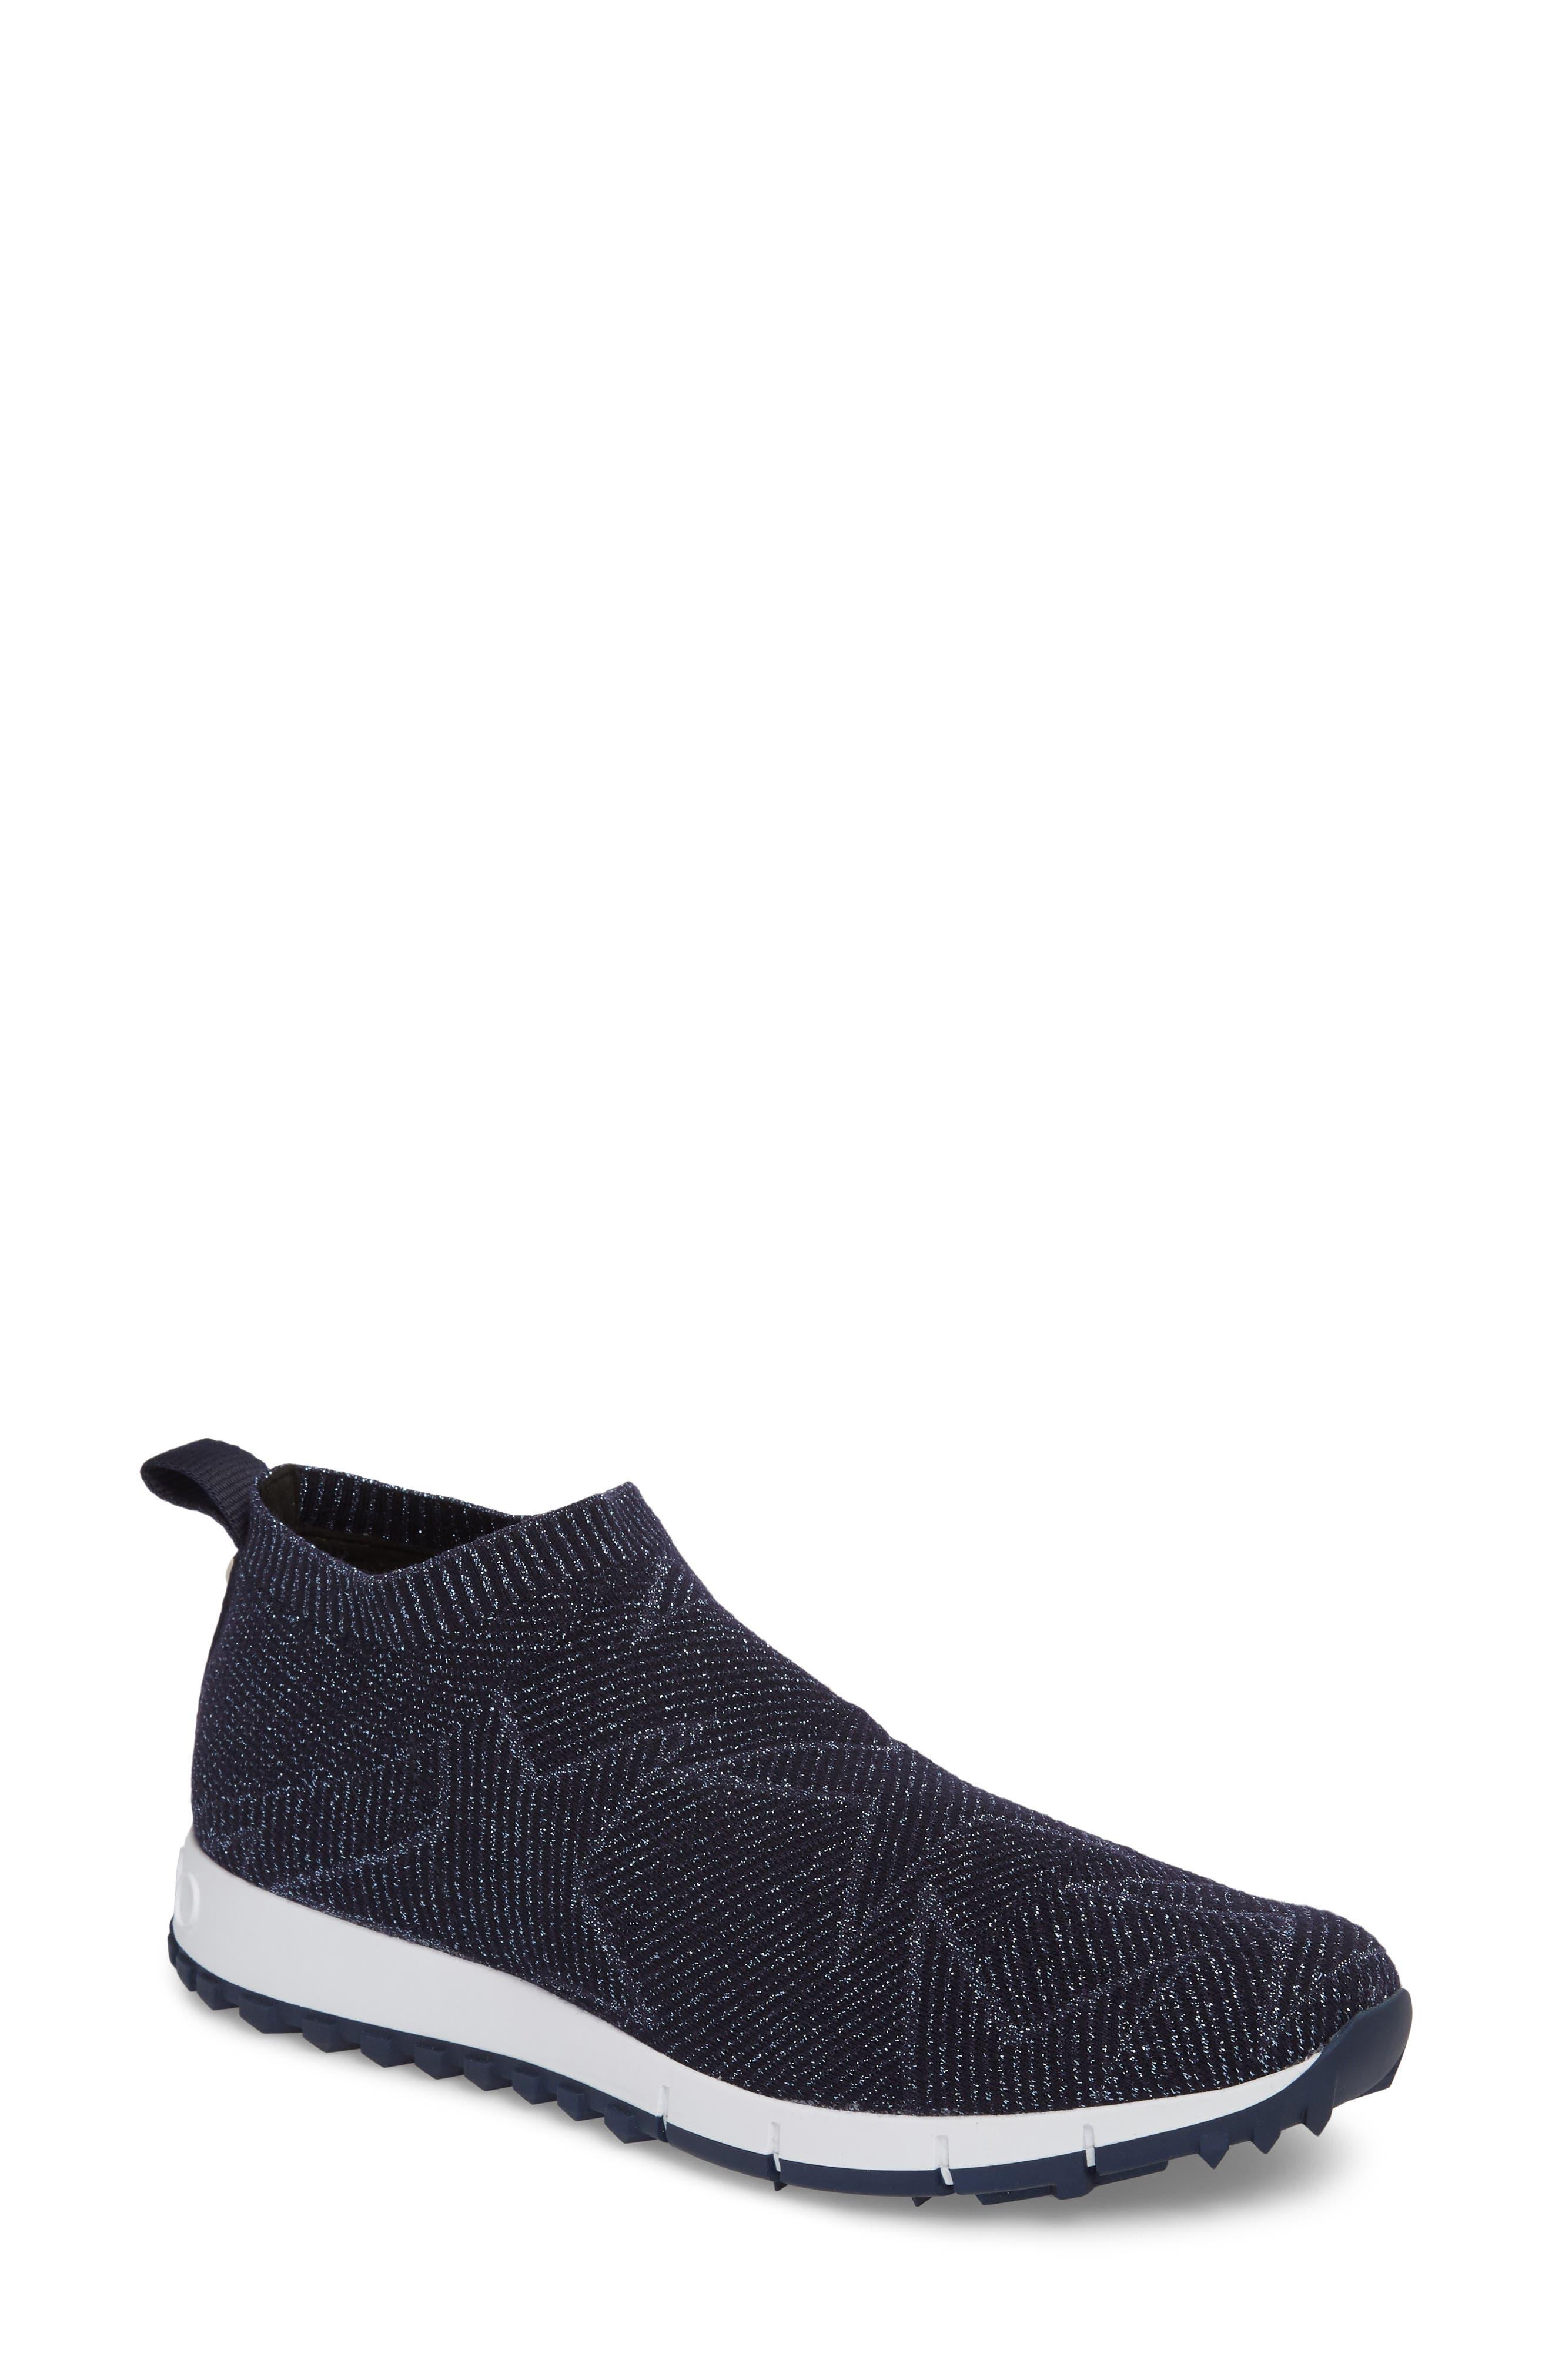 Norway Star Slip-On Sneaker,                             Main thumbnail 1, color,                             Navy